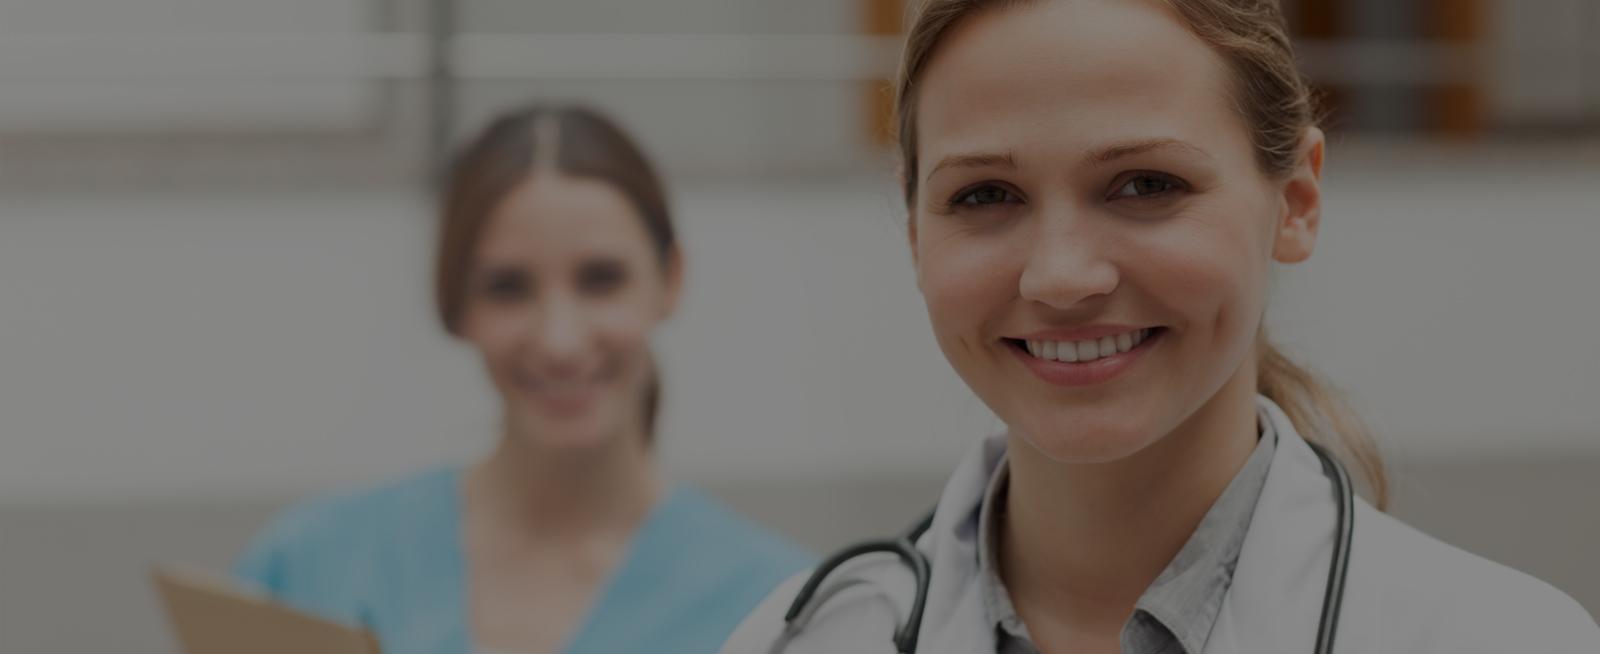 Gastroenterology Fellowship - LECOM Health